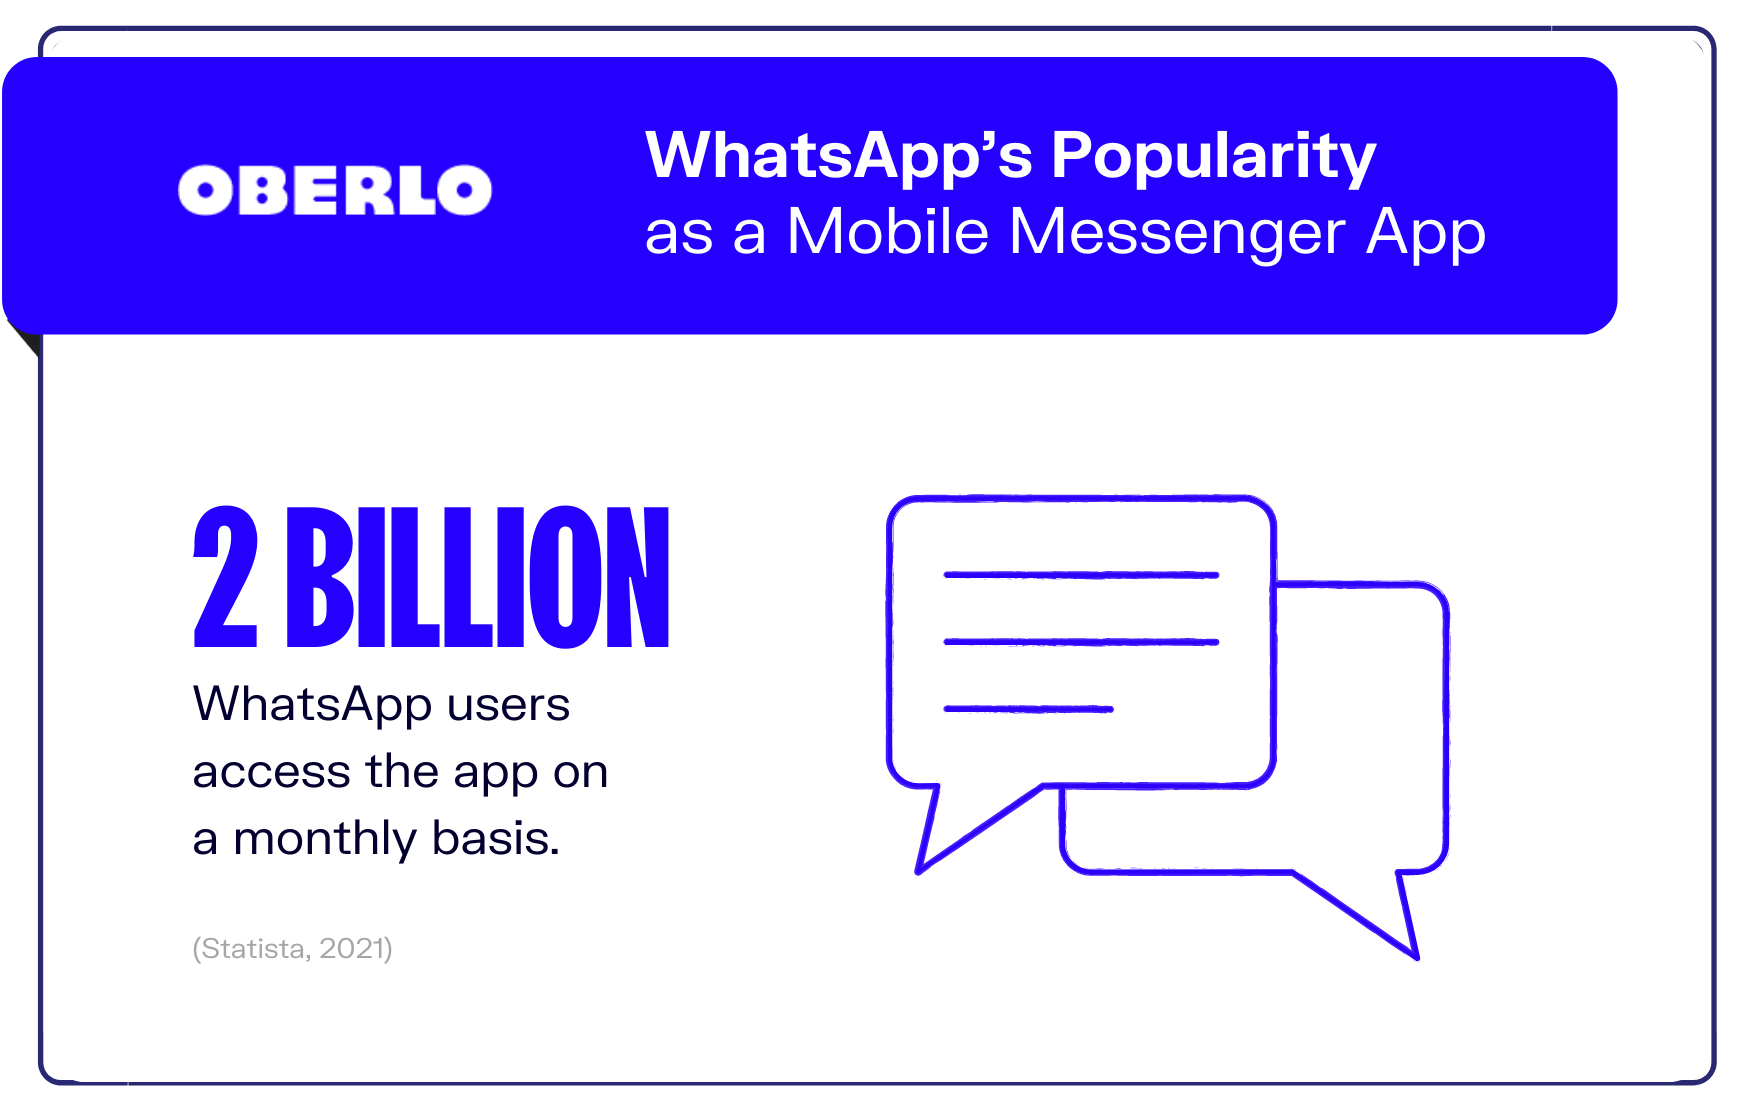 graphic of whatsapp statistic #2